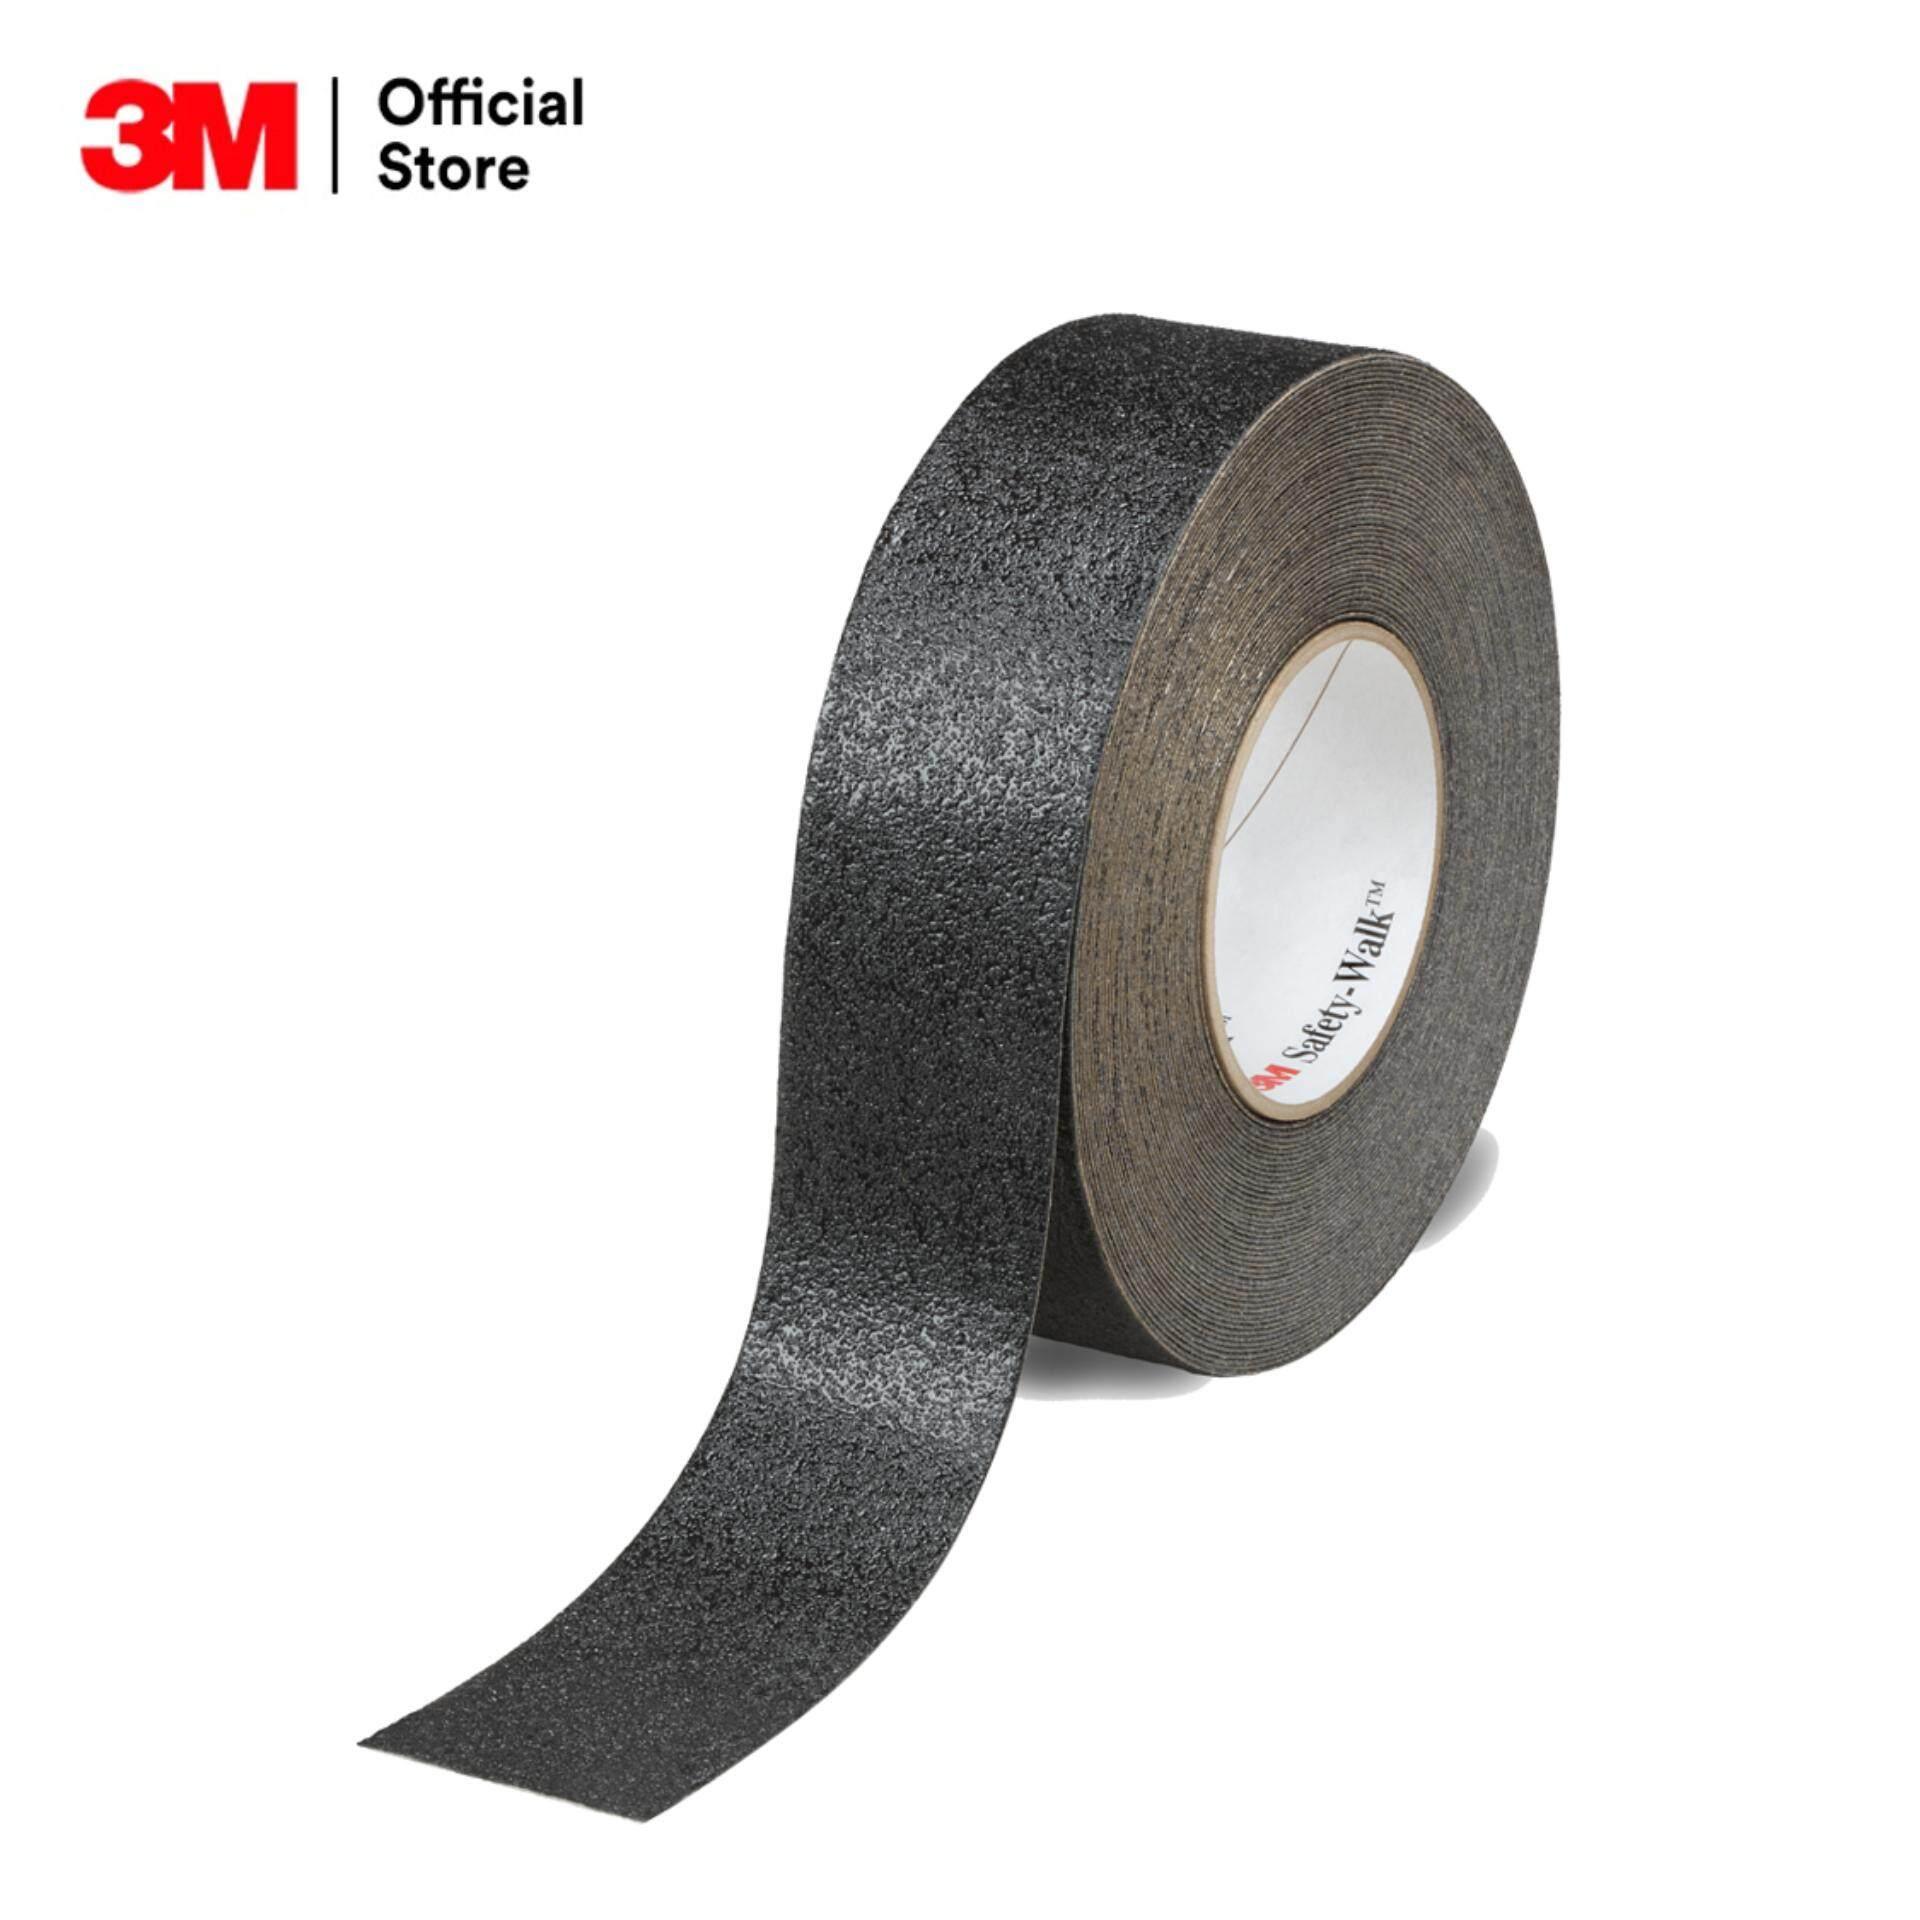 "S/W # 610 SAFETY-WALK WIDTH 3/4"" (BLACK) เทปกันลื่น รุ่น 610 ความหยาบมาก สีดำ ขนาด 3/4"